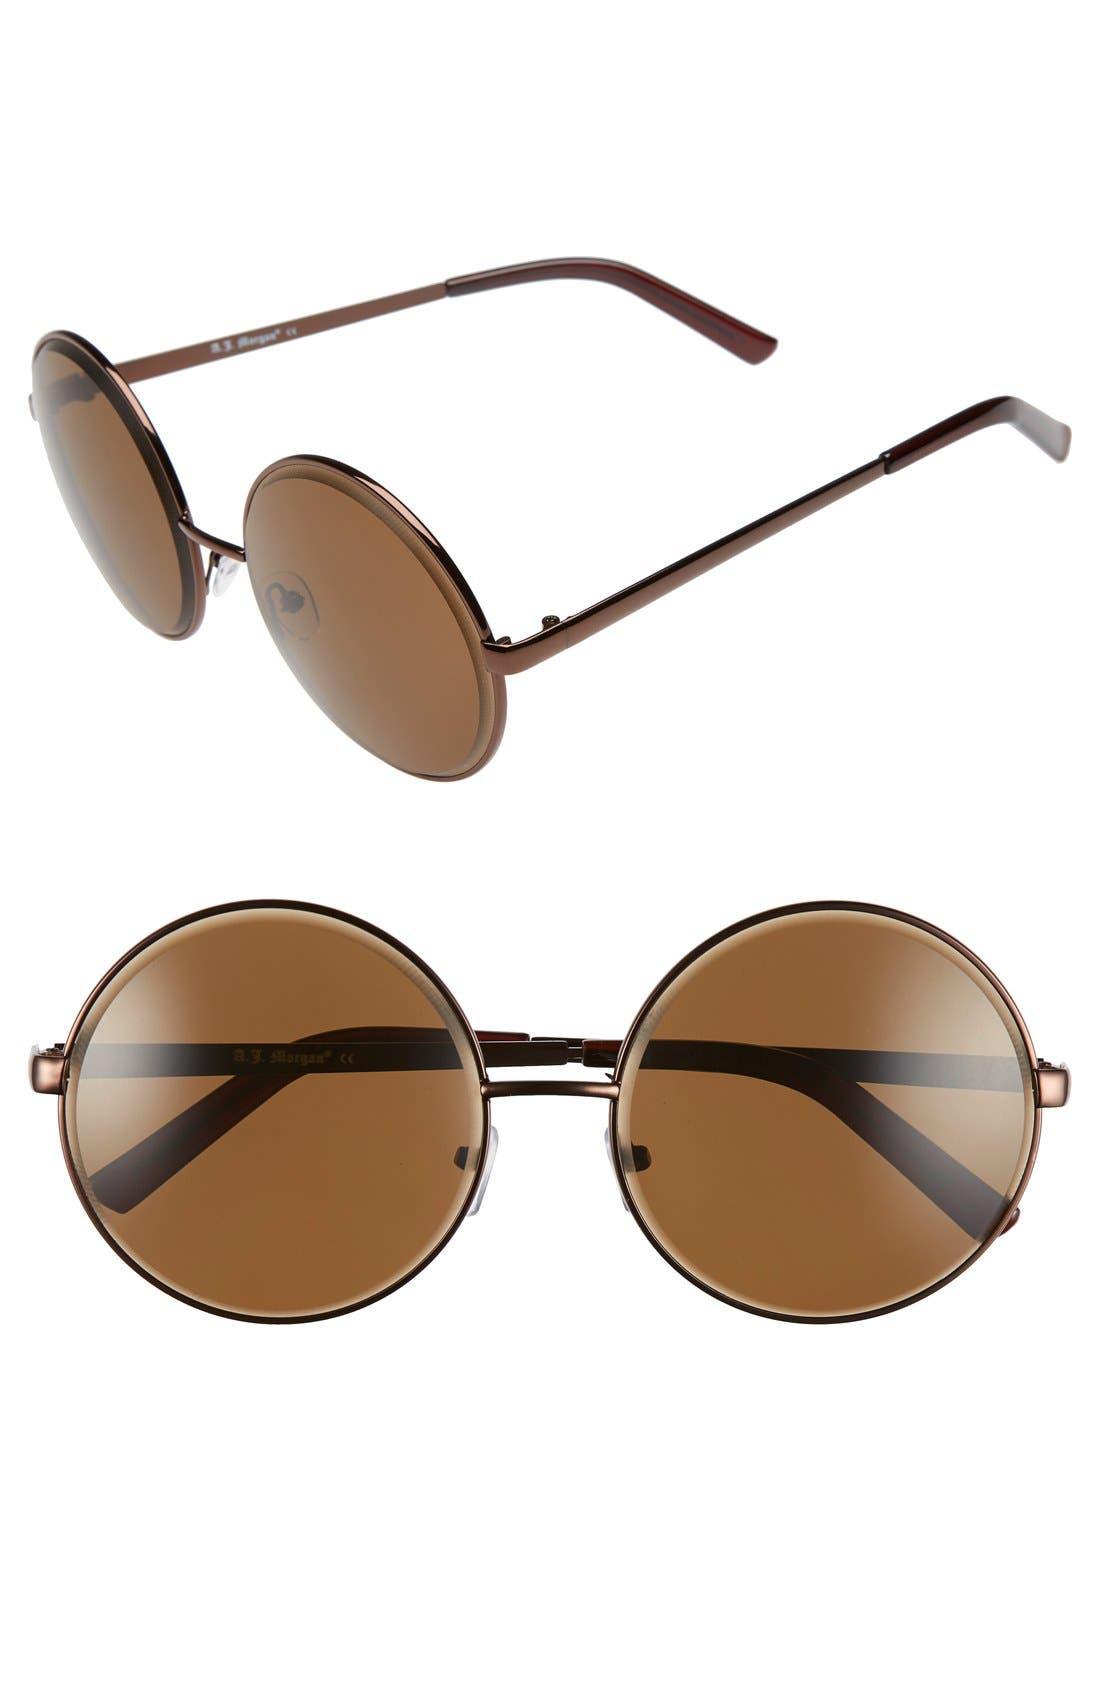 Alternate Image 1 Selected - A.J. Morgan 'Global' 60mm Oversize Round Sunglasses